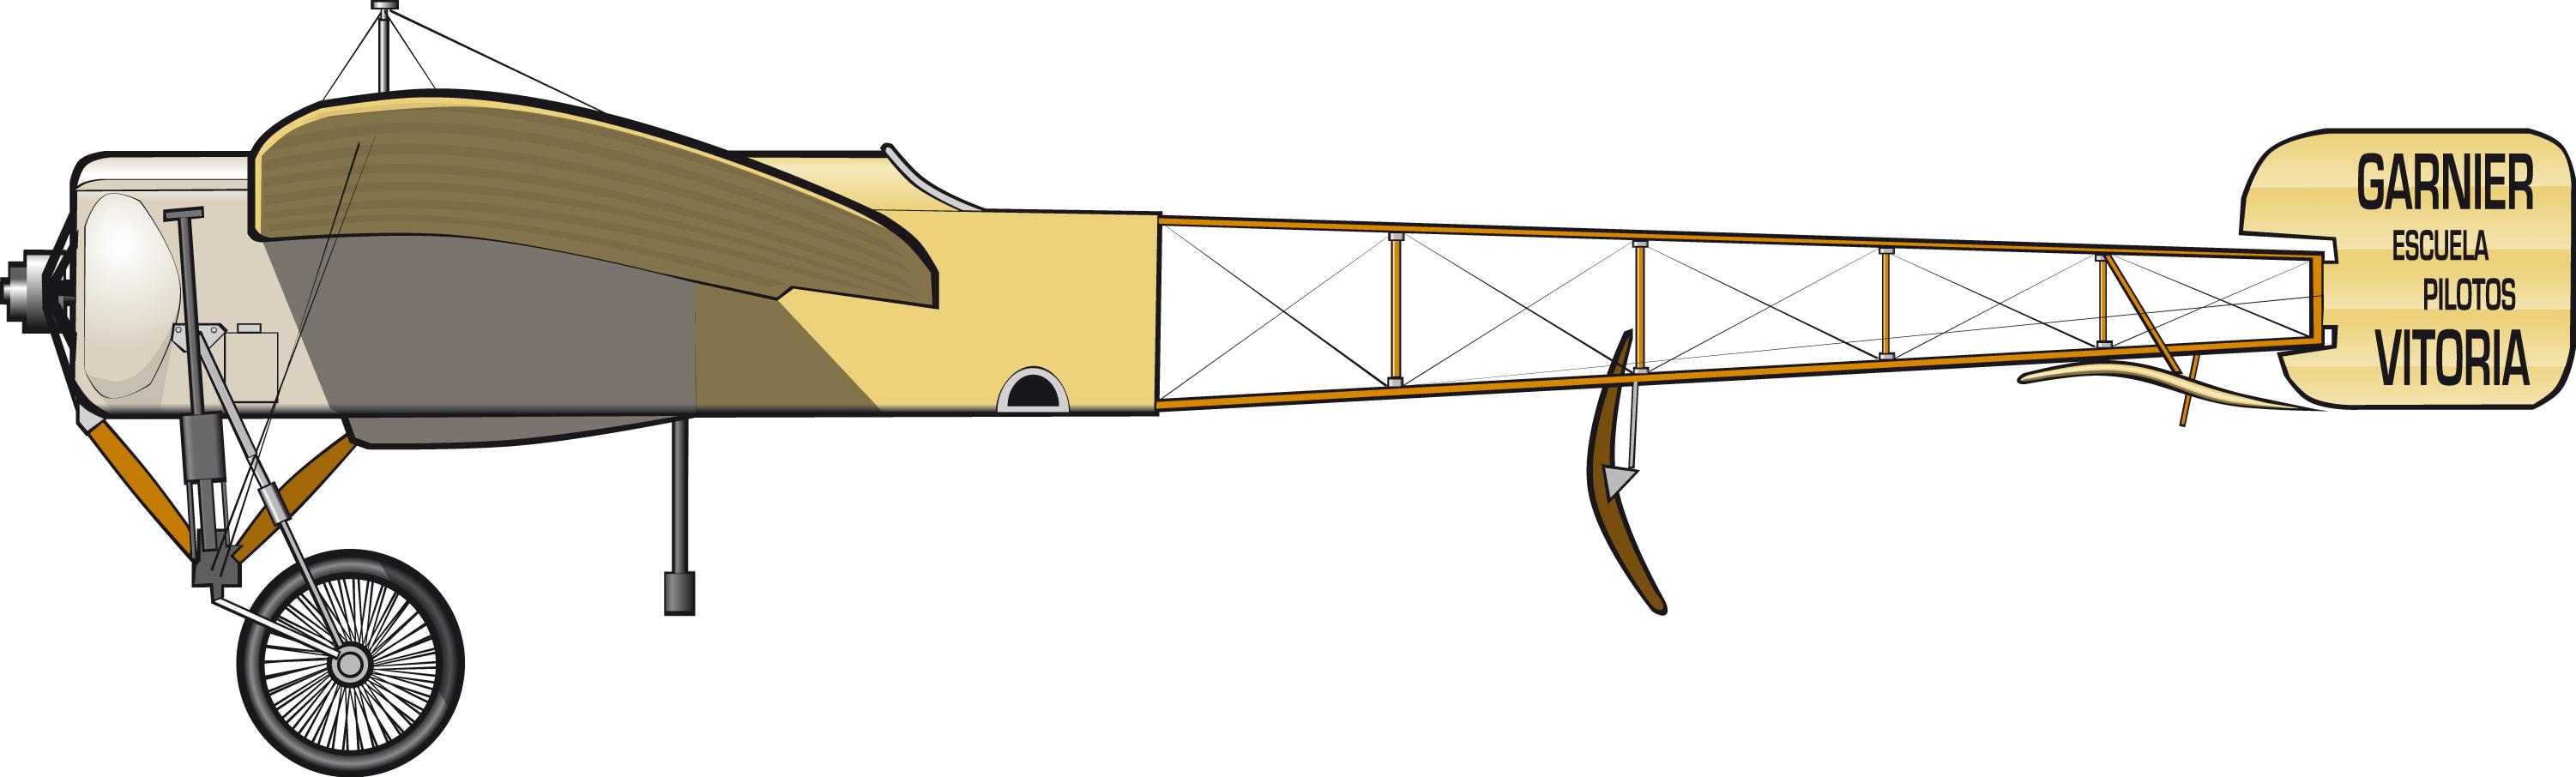 bleriotxigarnier1913